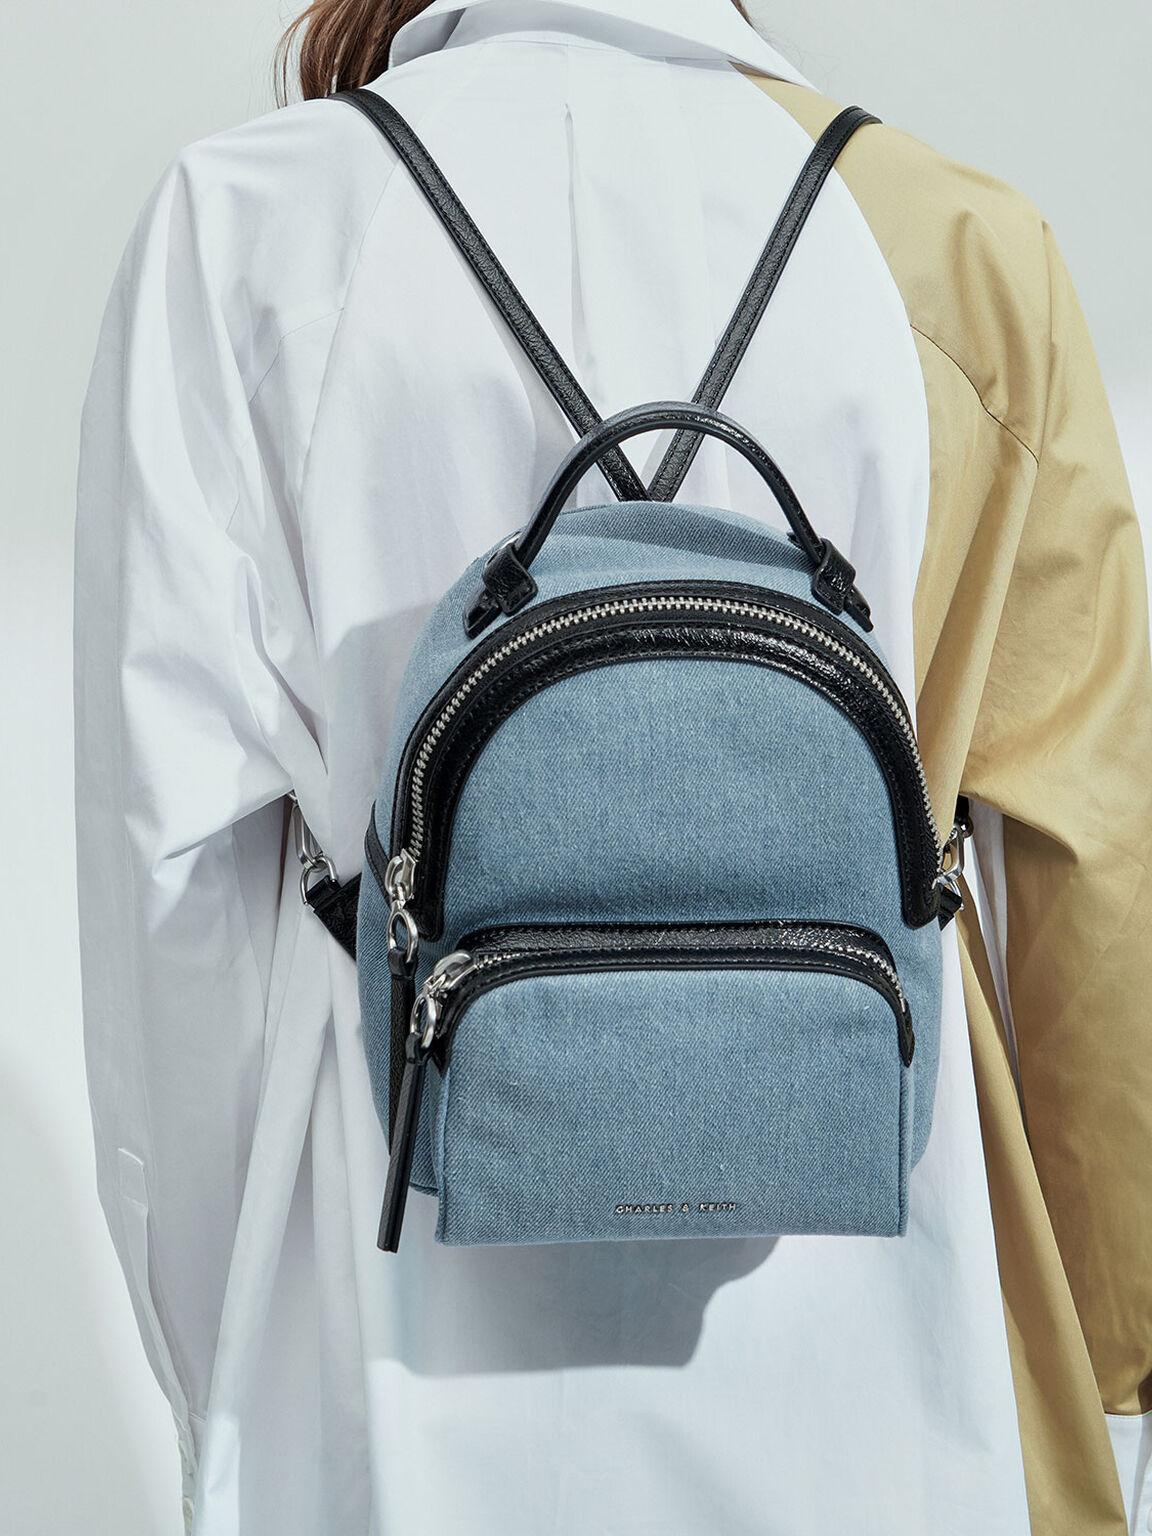 Textured Top Handle Backpack, Denim Blue, hi-res